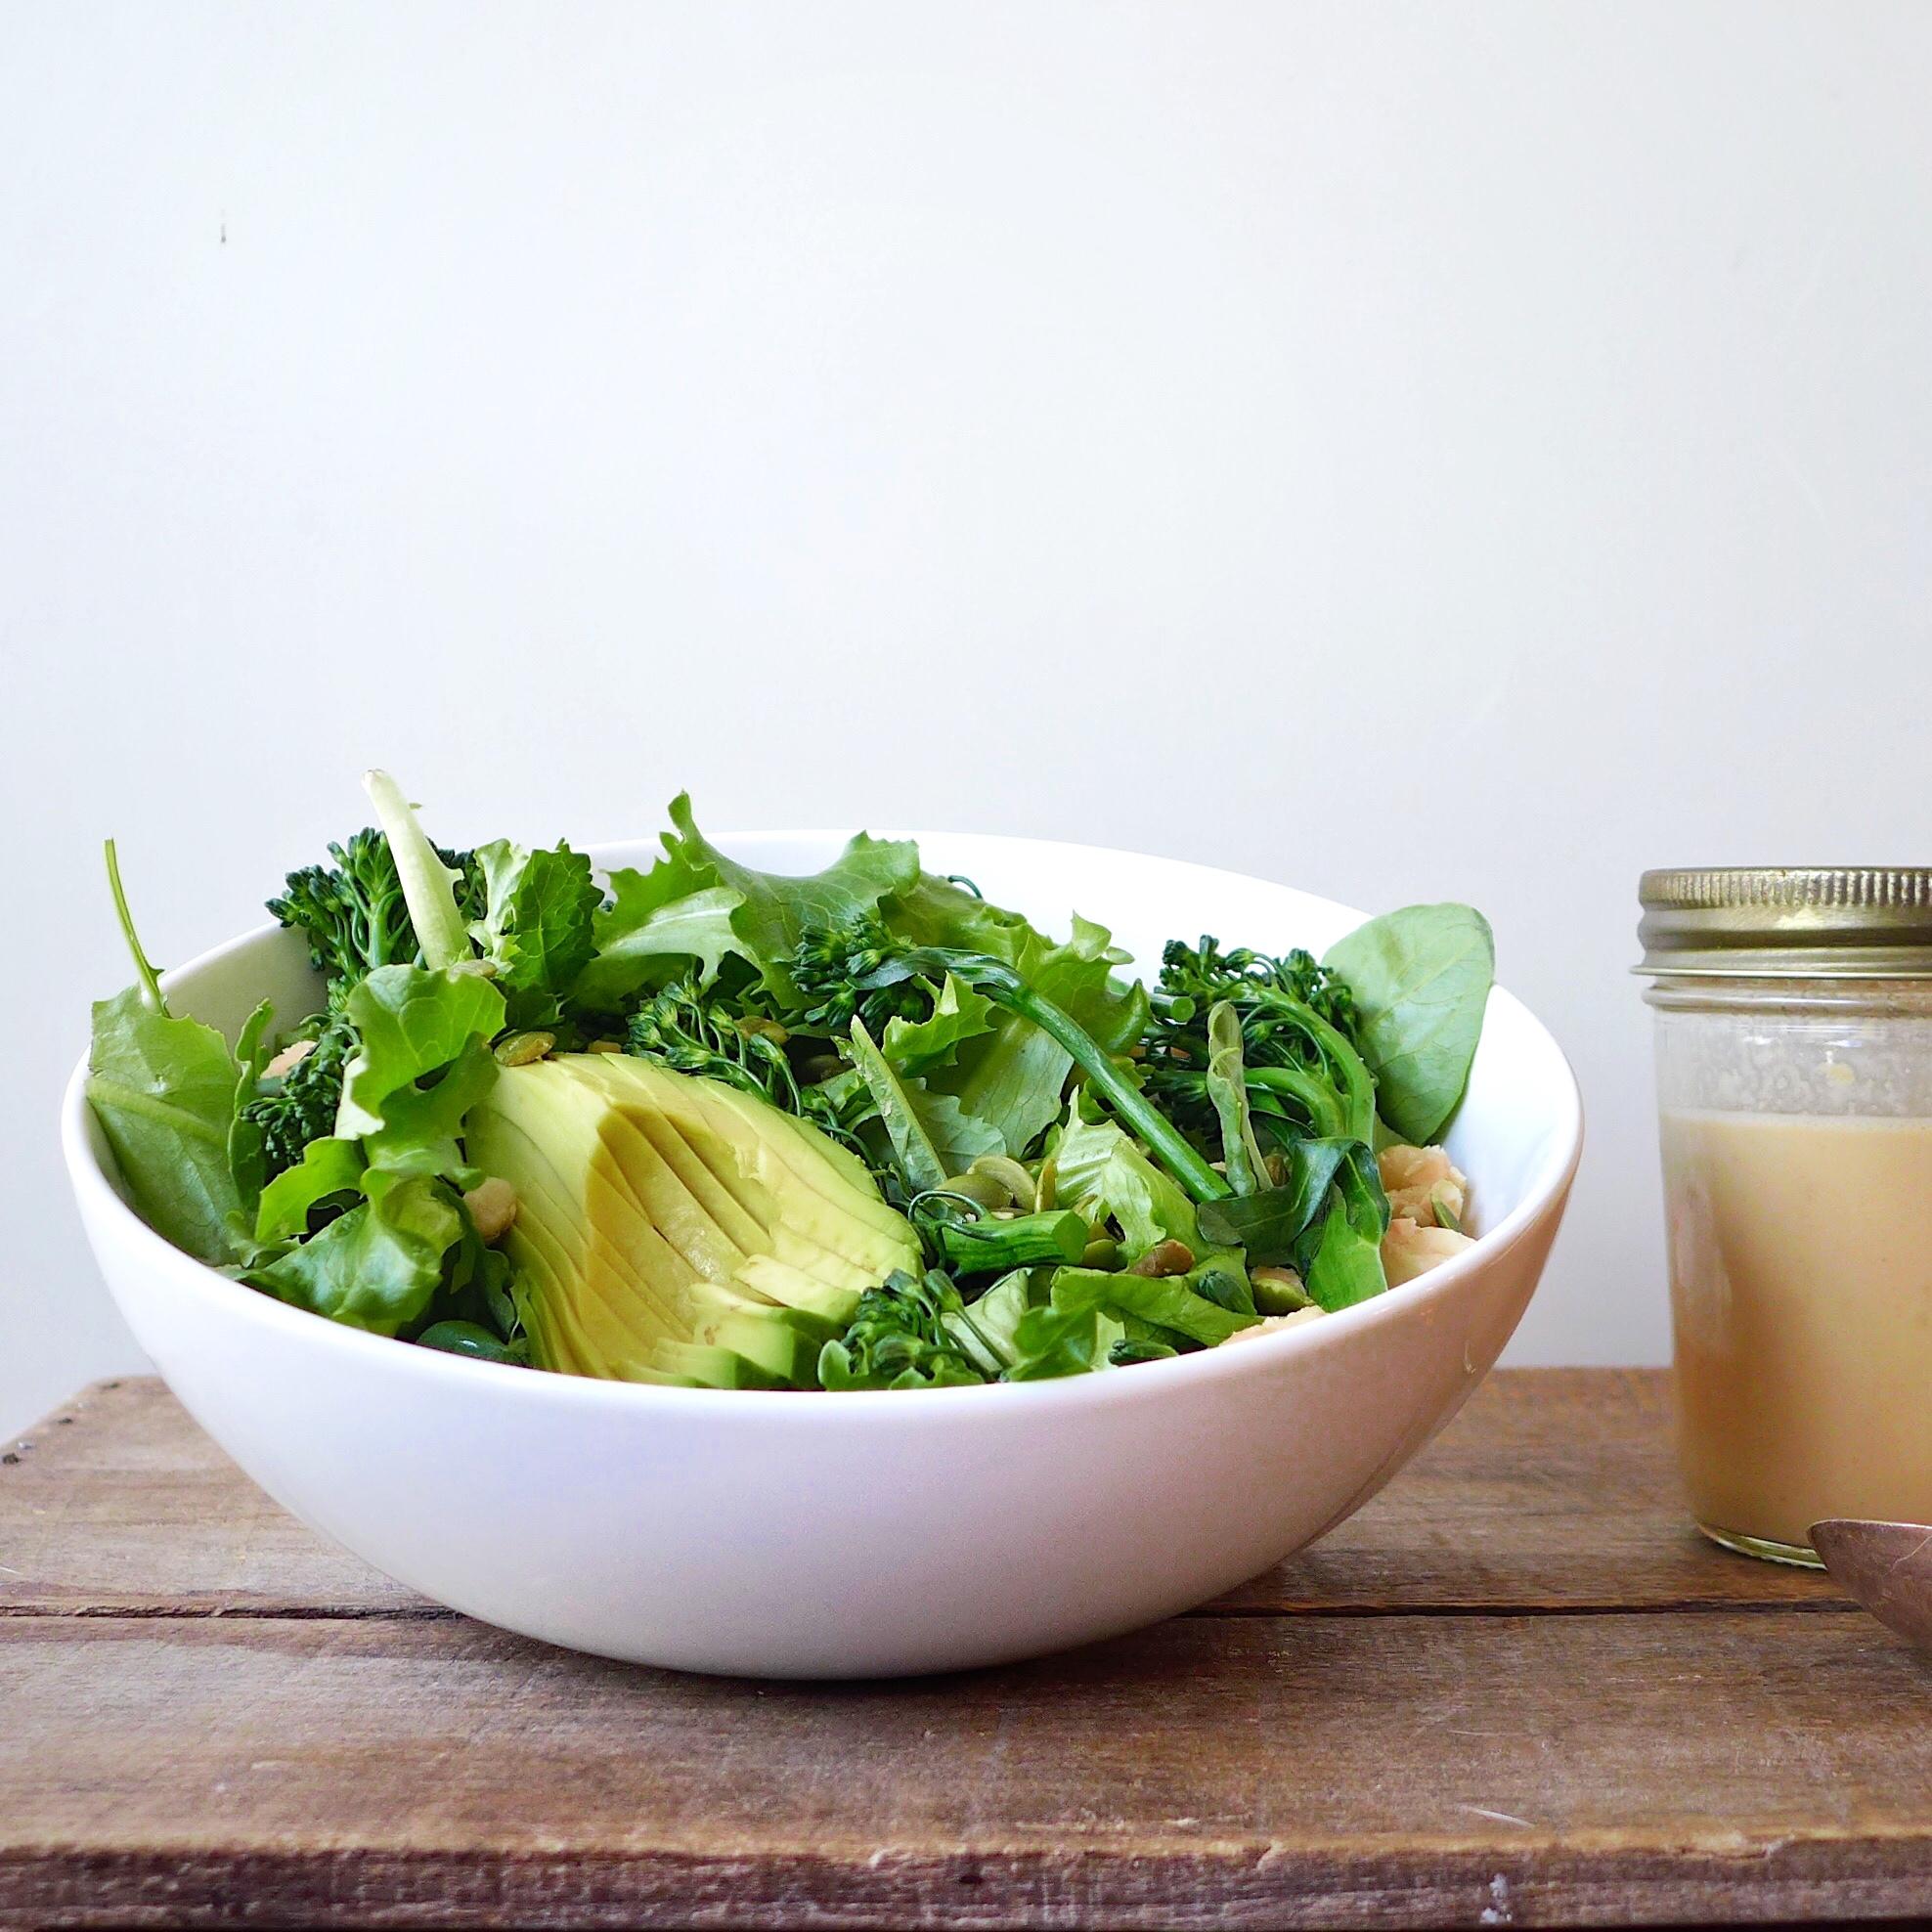 _3175 Clean Eating Rezepte von Superfoods wie Avocado Quinoa Chia Kurkuma planetbox du entscheidest de